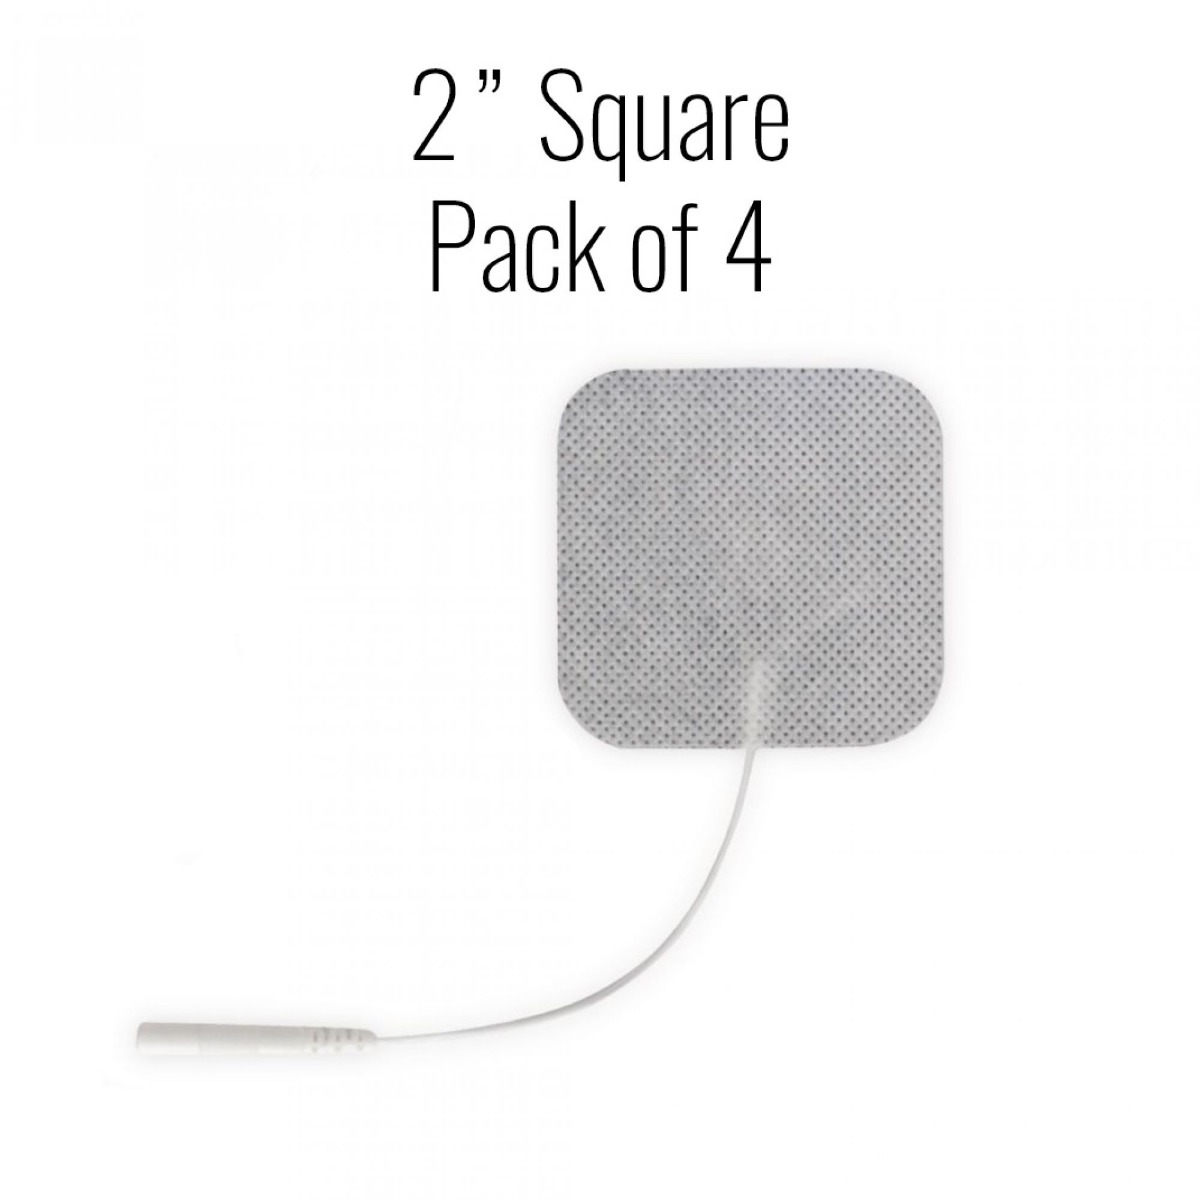 "Metron Cloth Electrodes, 2"" Square, 4/pk."